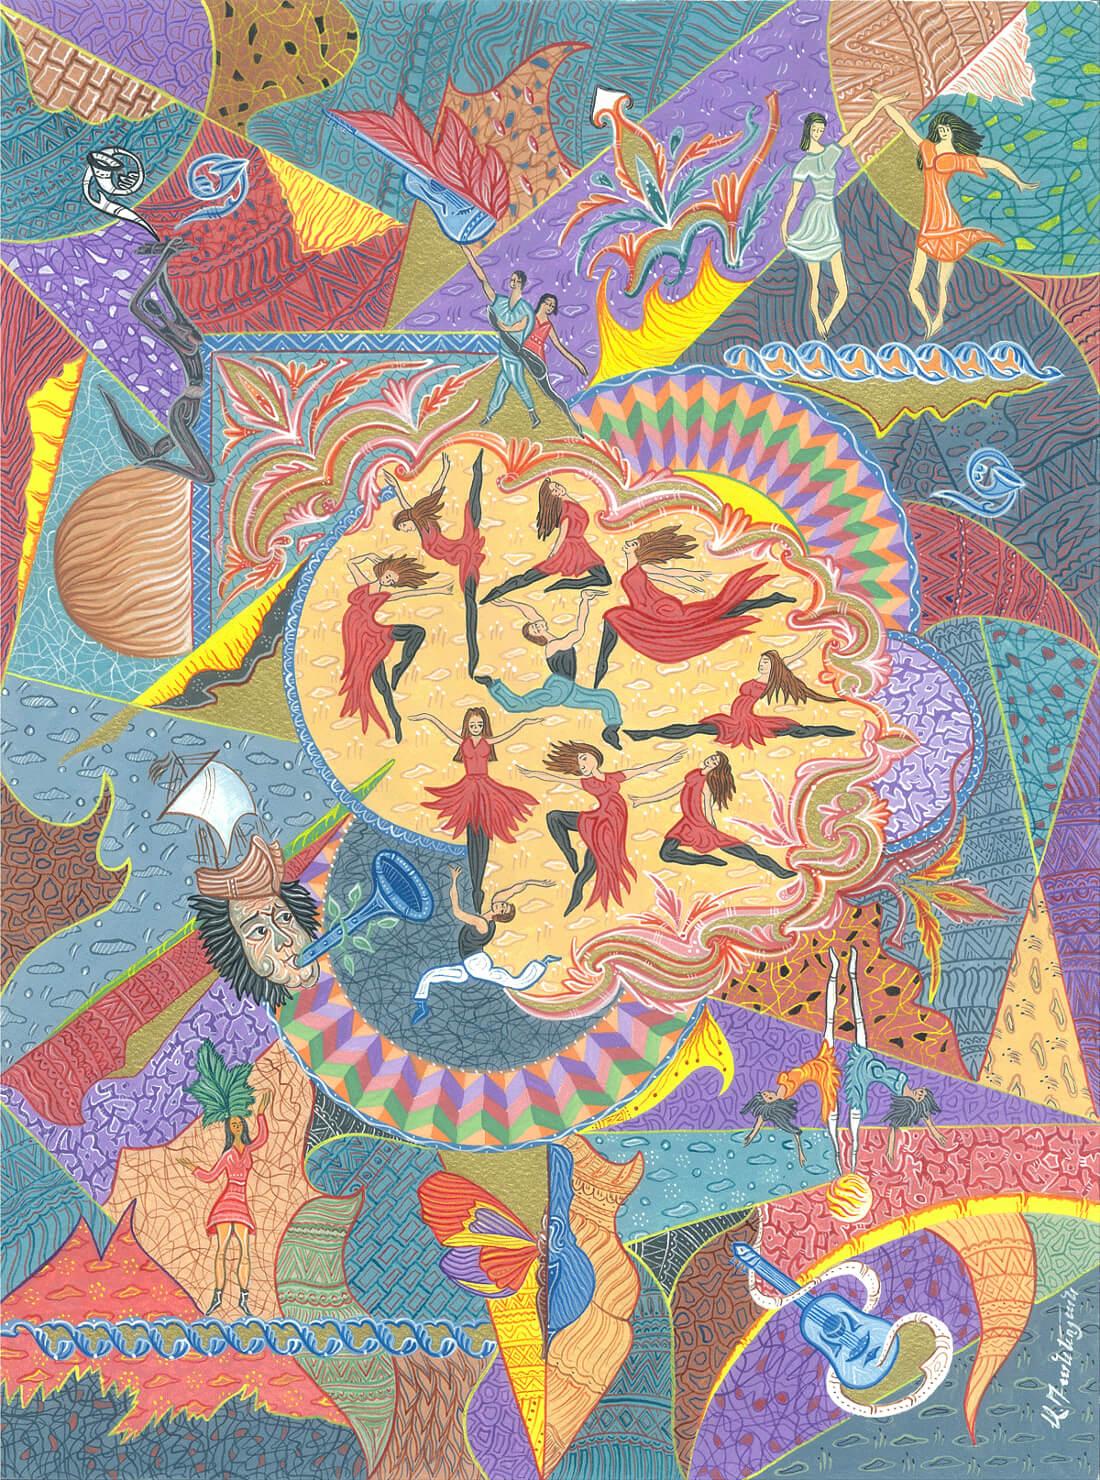 Dance forever, by Armen Daneghyan